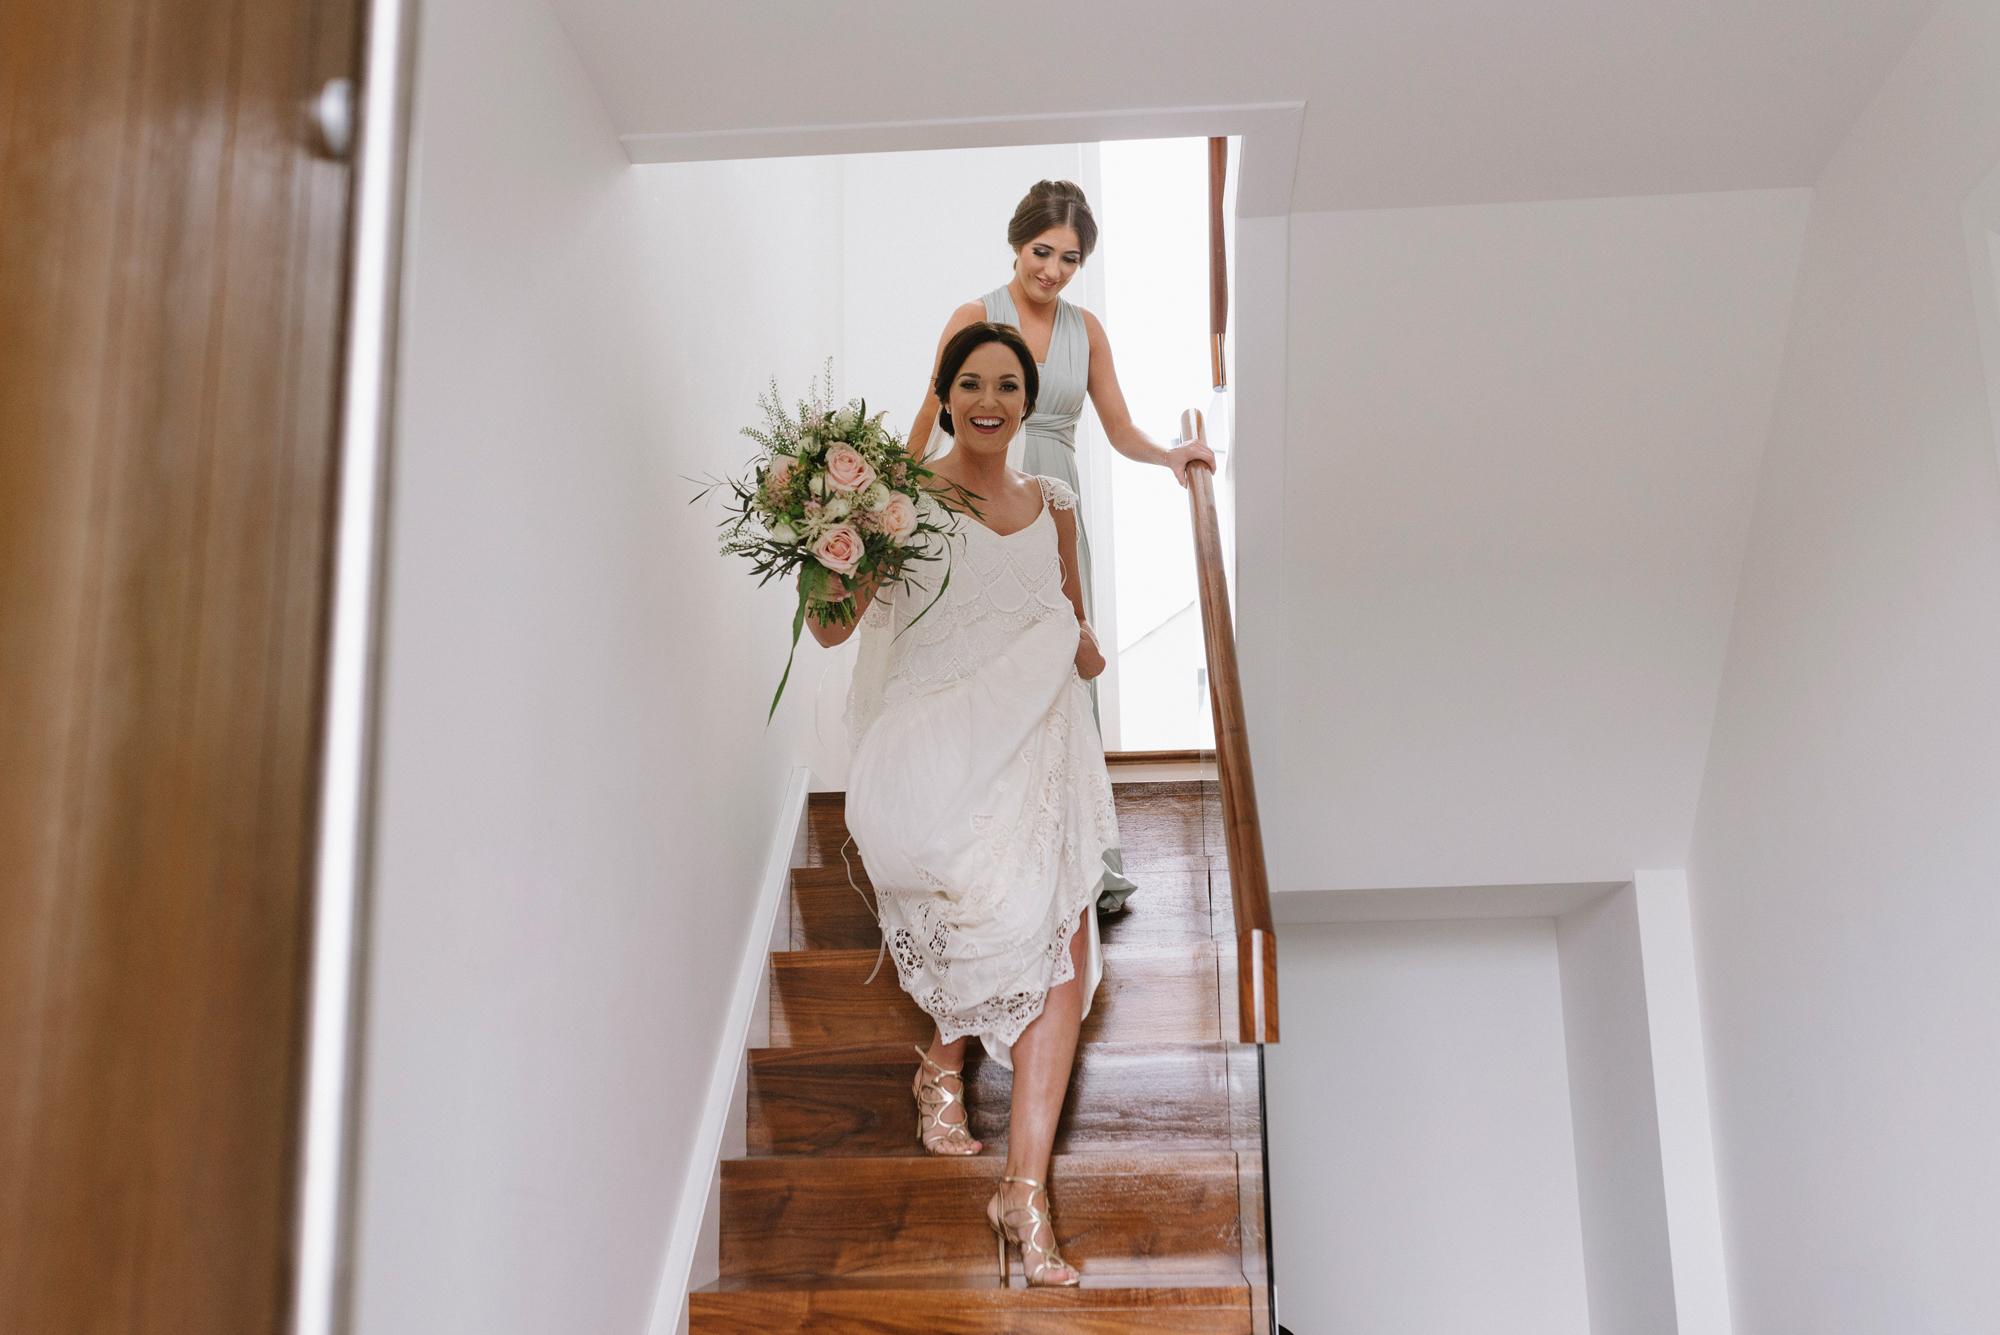 ghan_house_Wedding_Sarah_Fyffe_wedding_photographyer_5.jpg